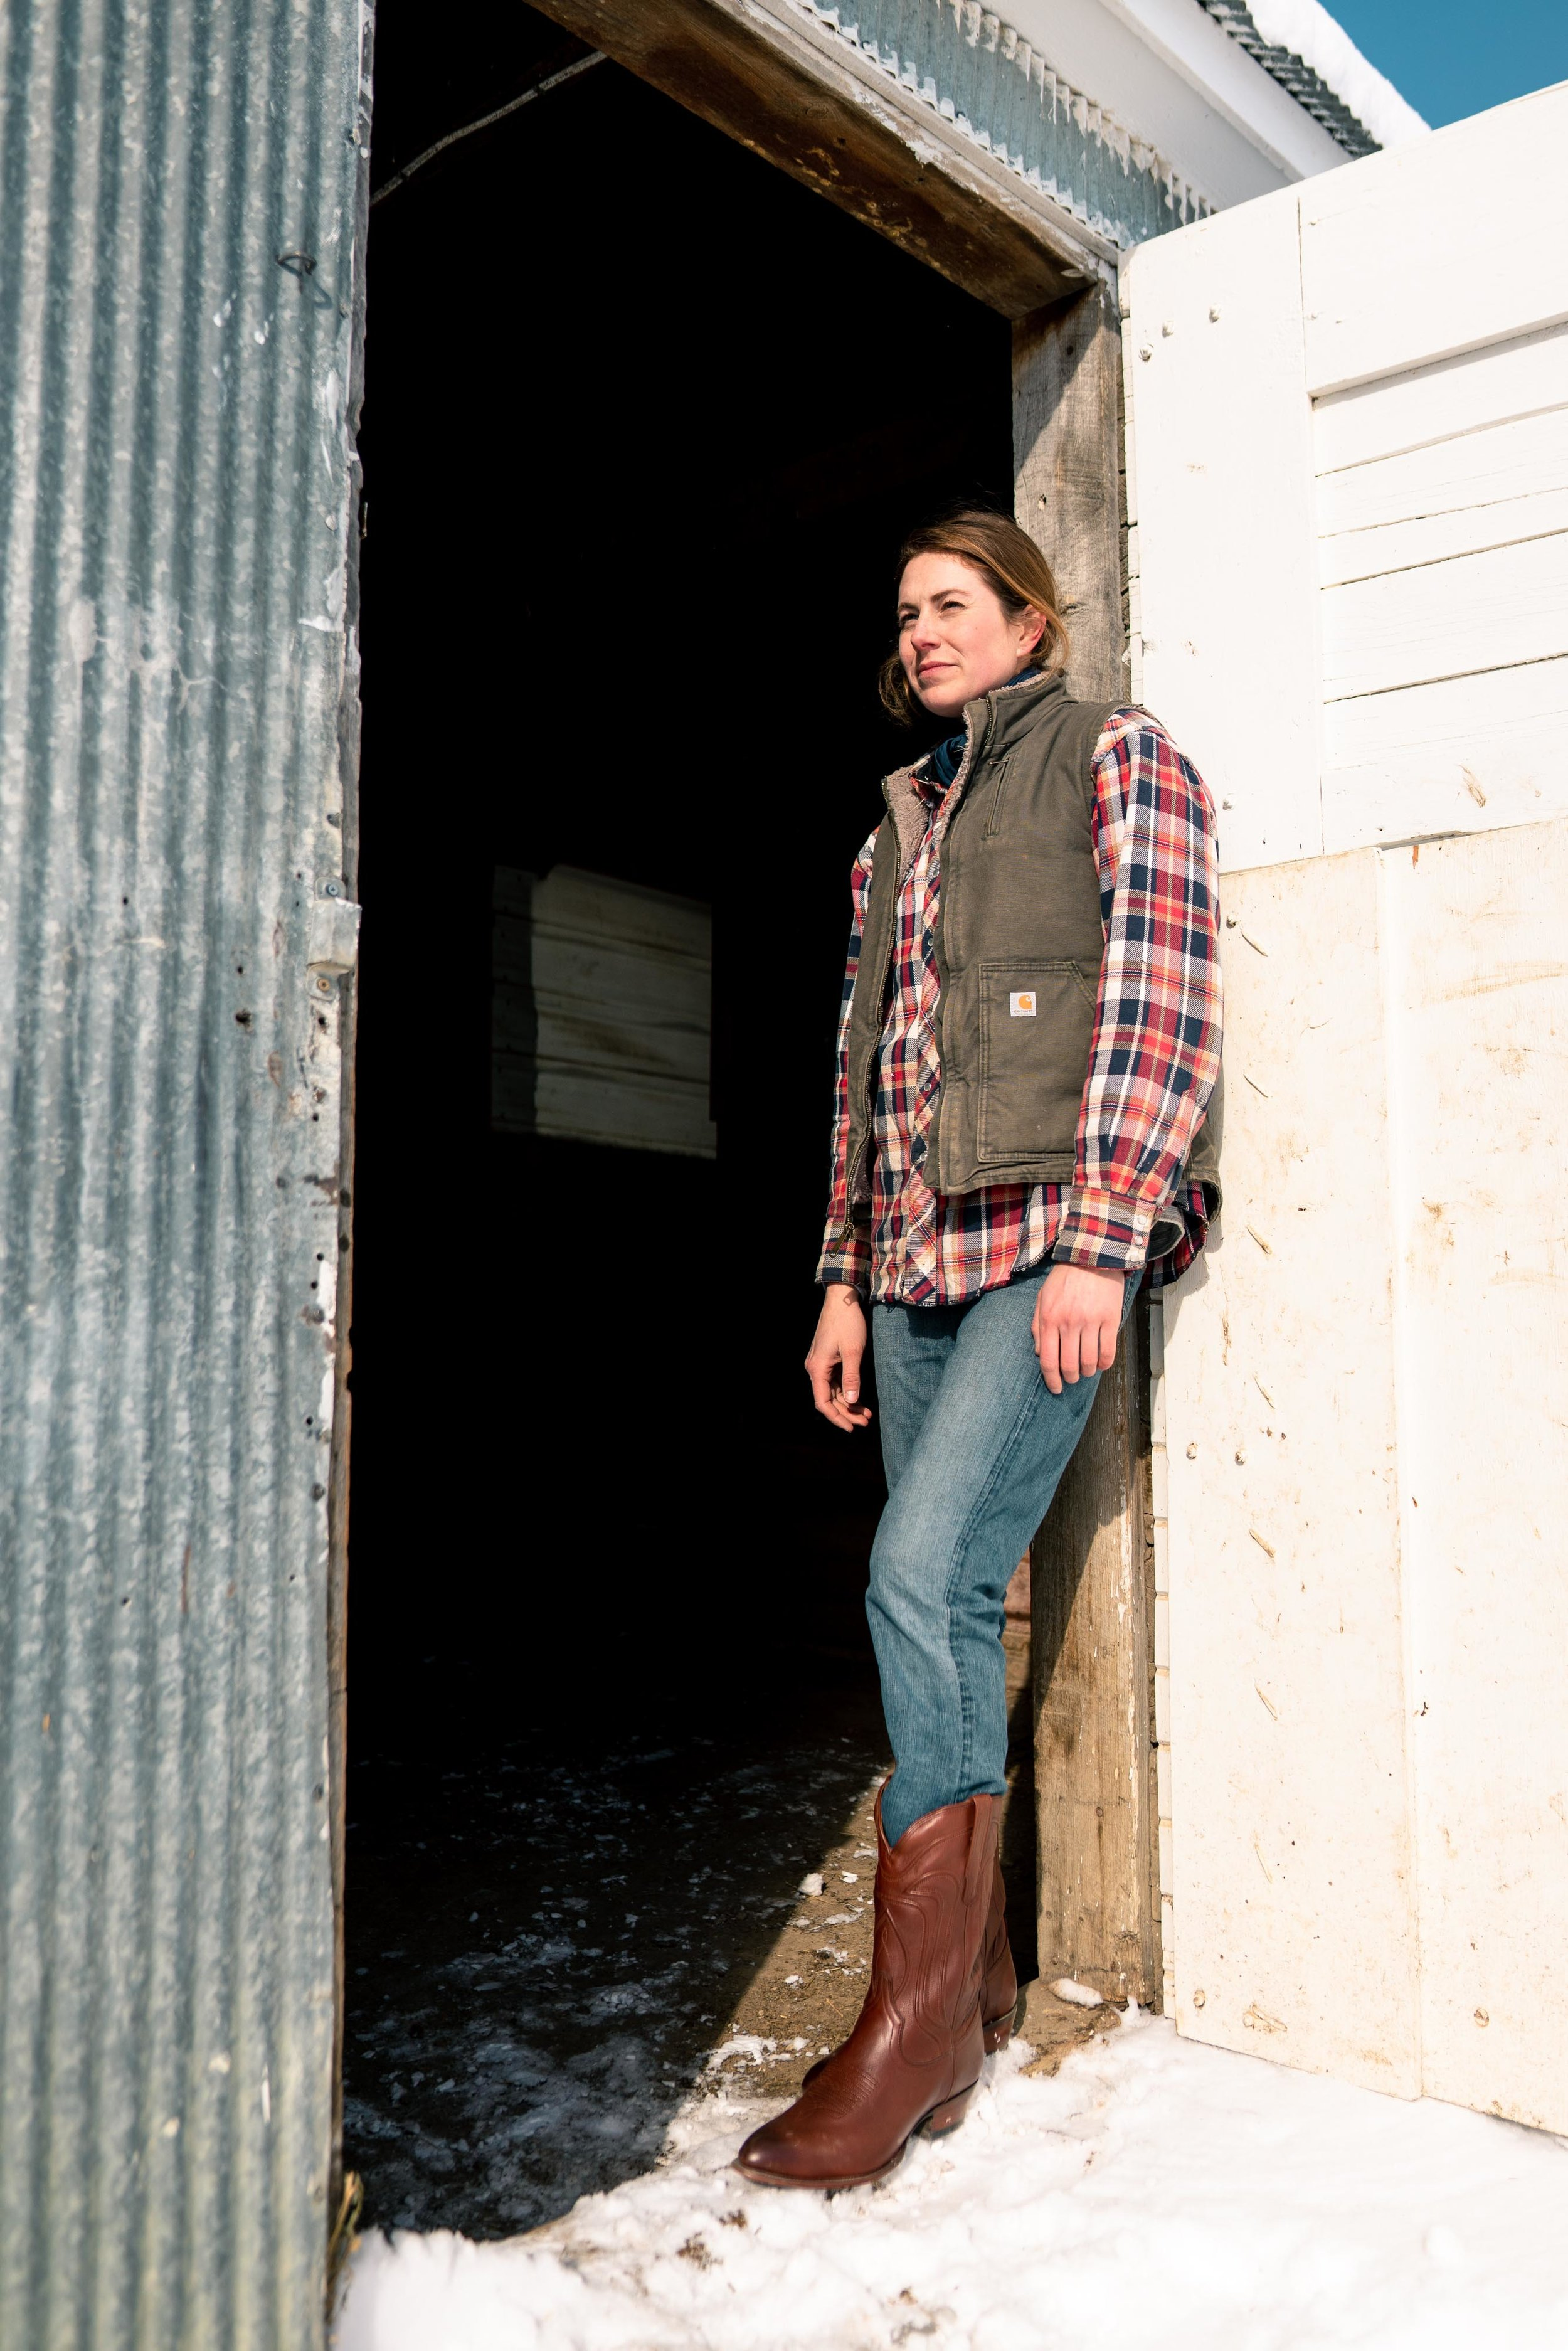 Jenna Flatgard wearing Tecovas while pausing in the sun in eastern Montana.